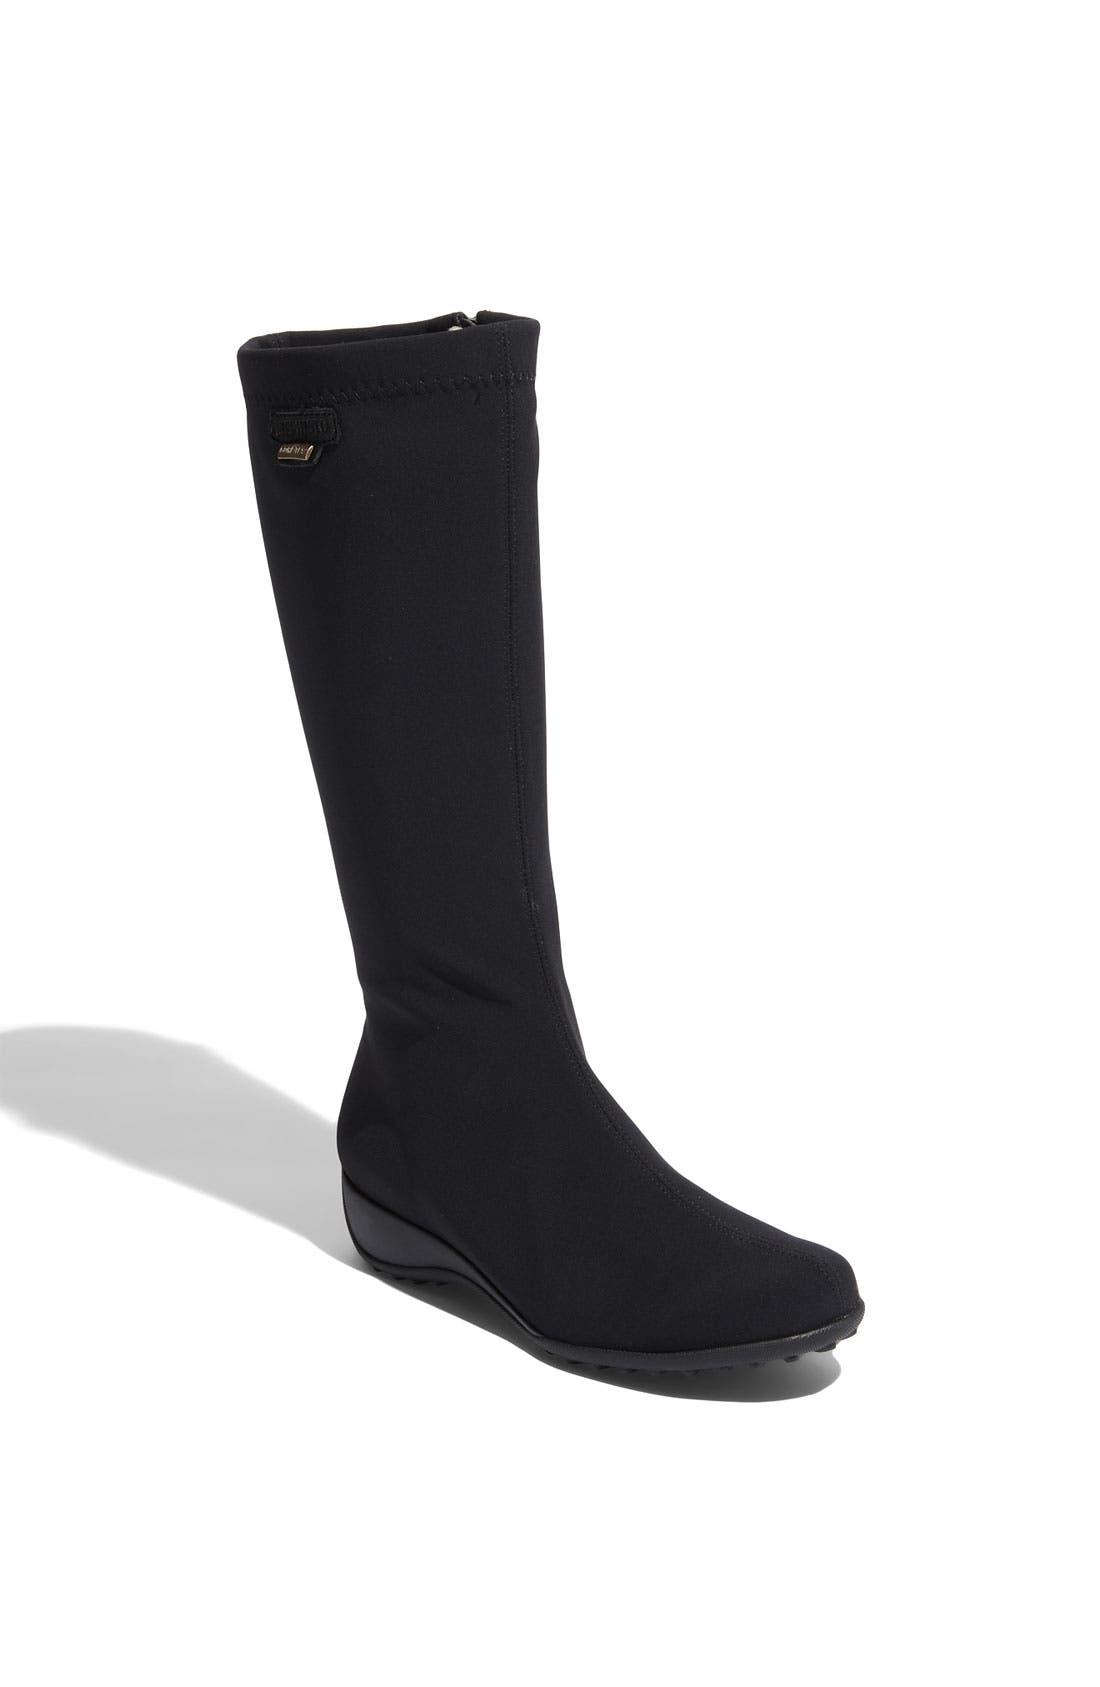 Main Image - Mephisto 'Linda' Waterproof Stretch Boot